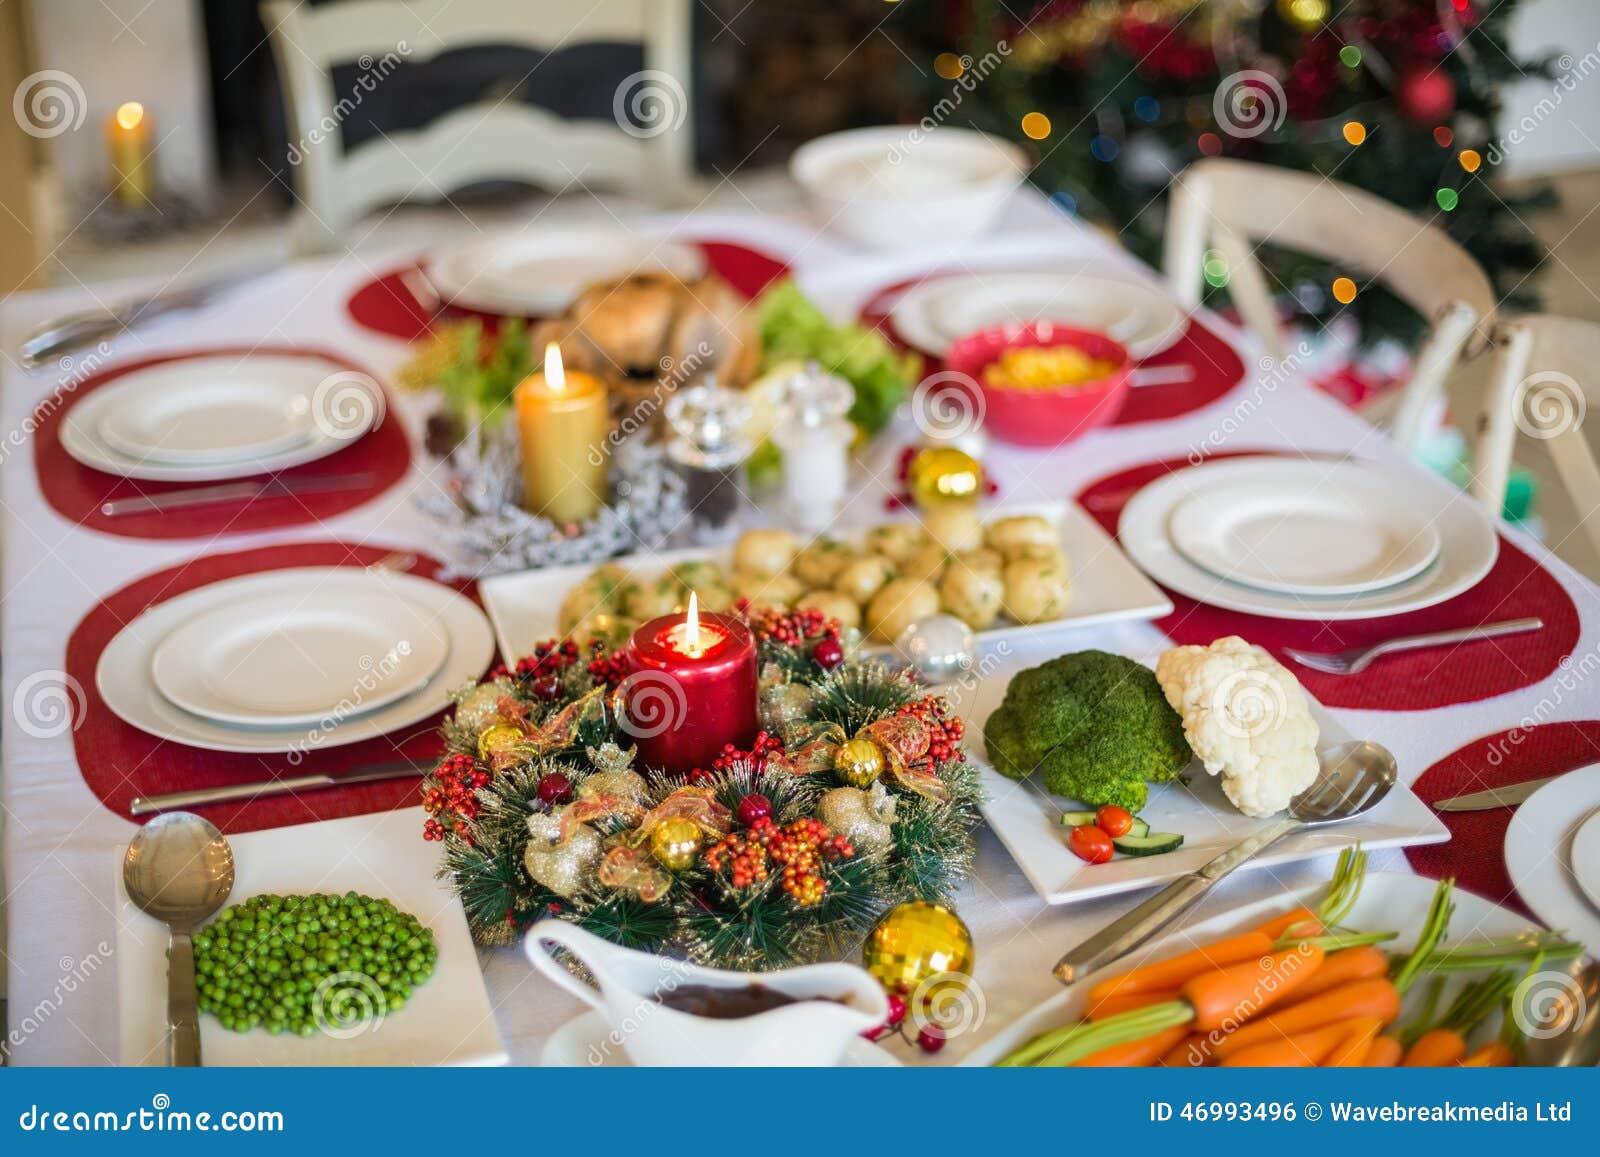 Table Set For Christmas Dinner Stock Photo Image 46993496